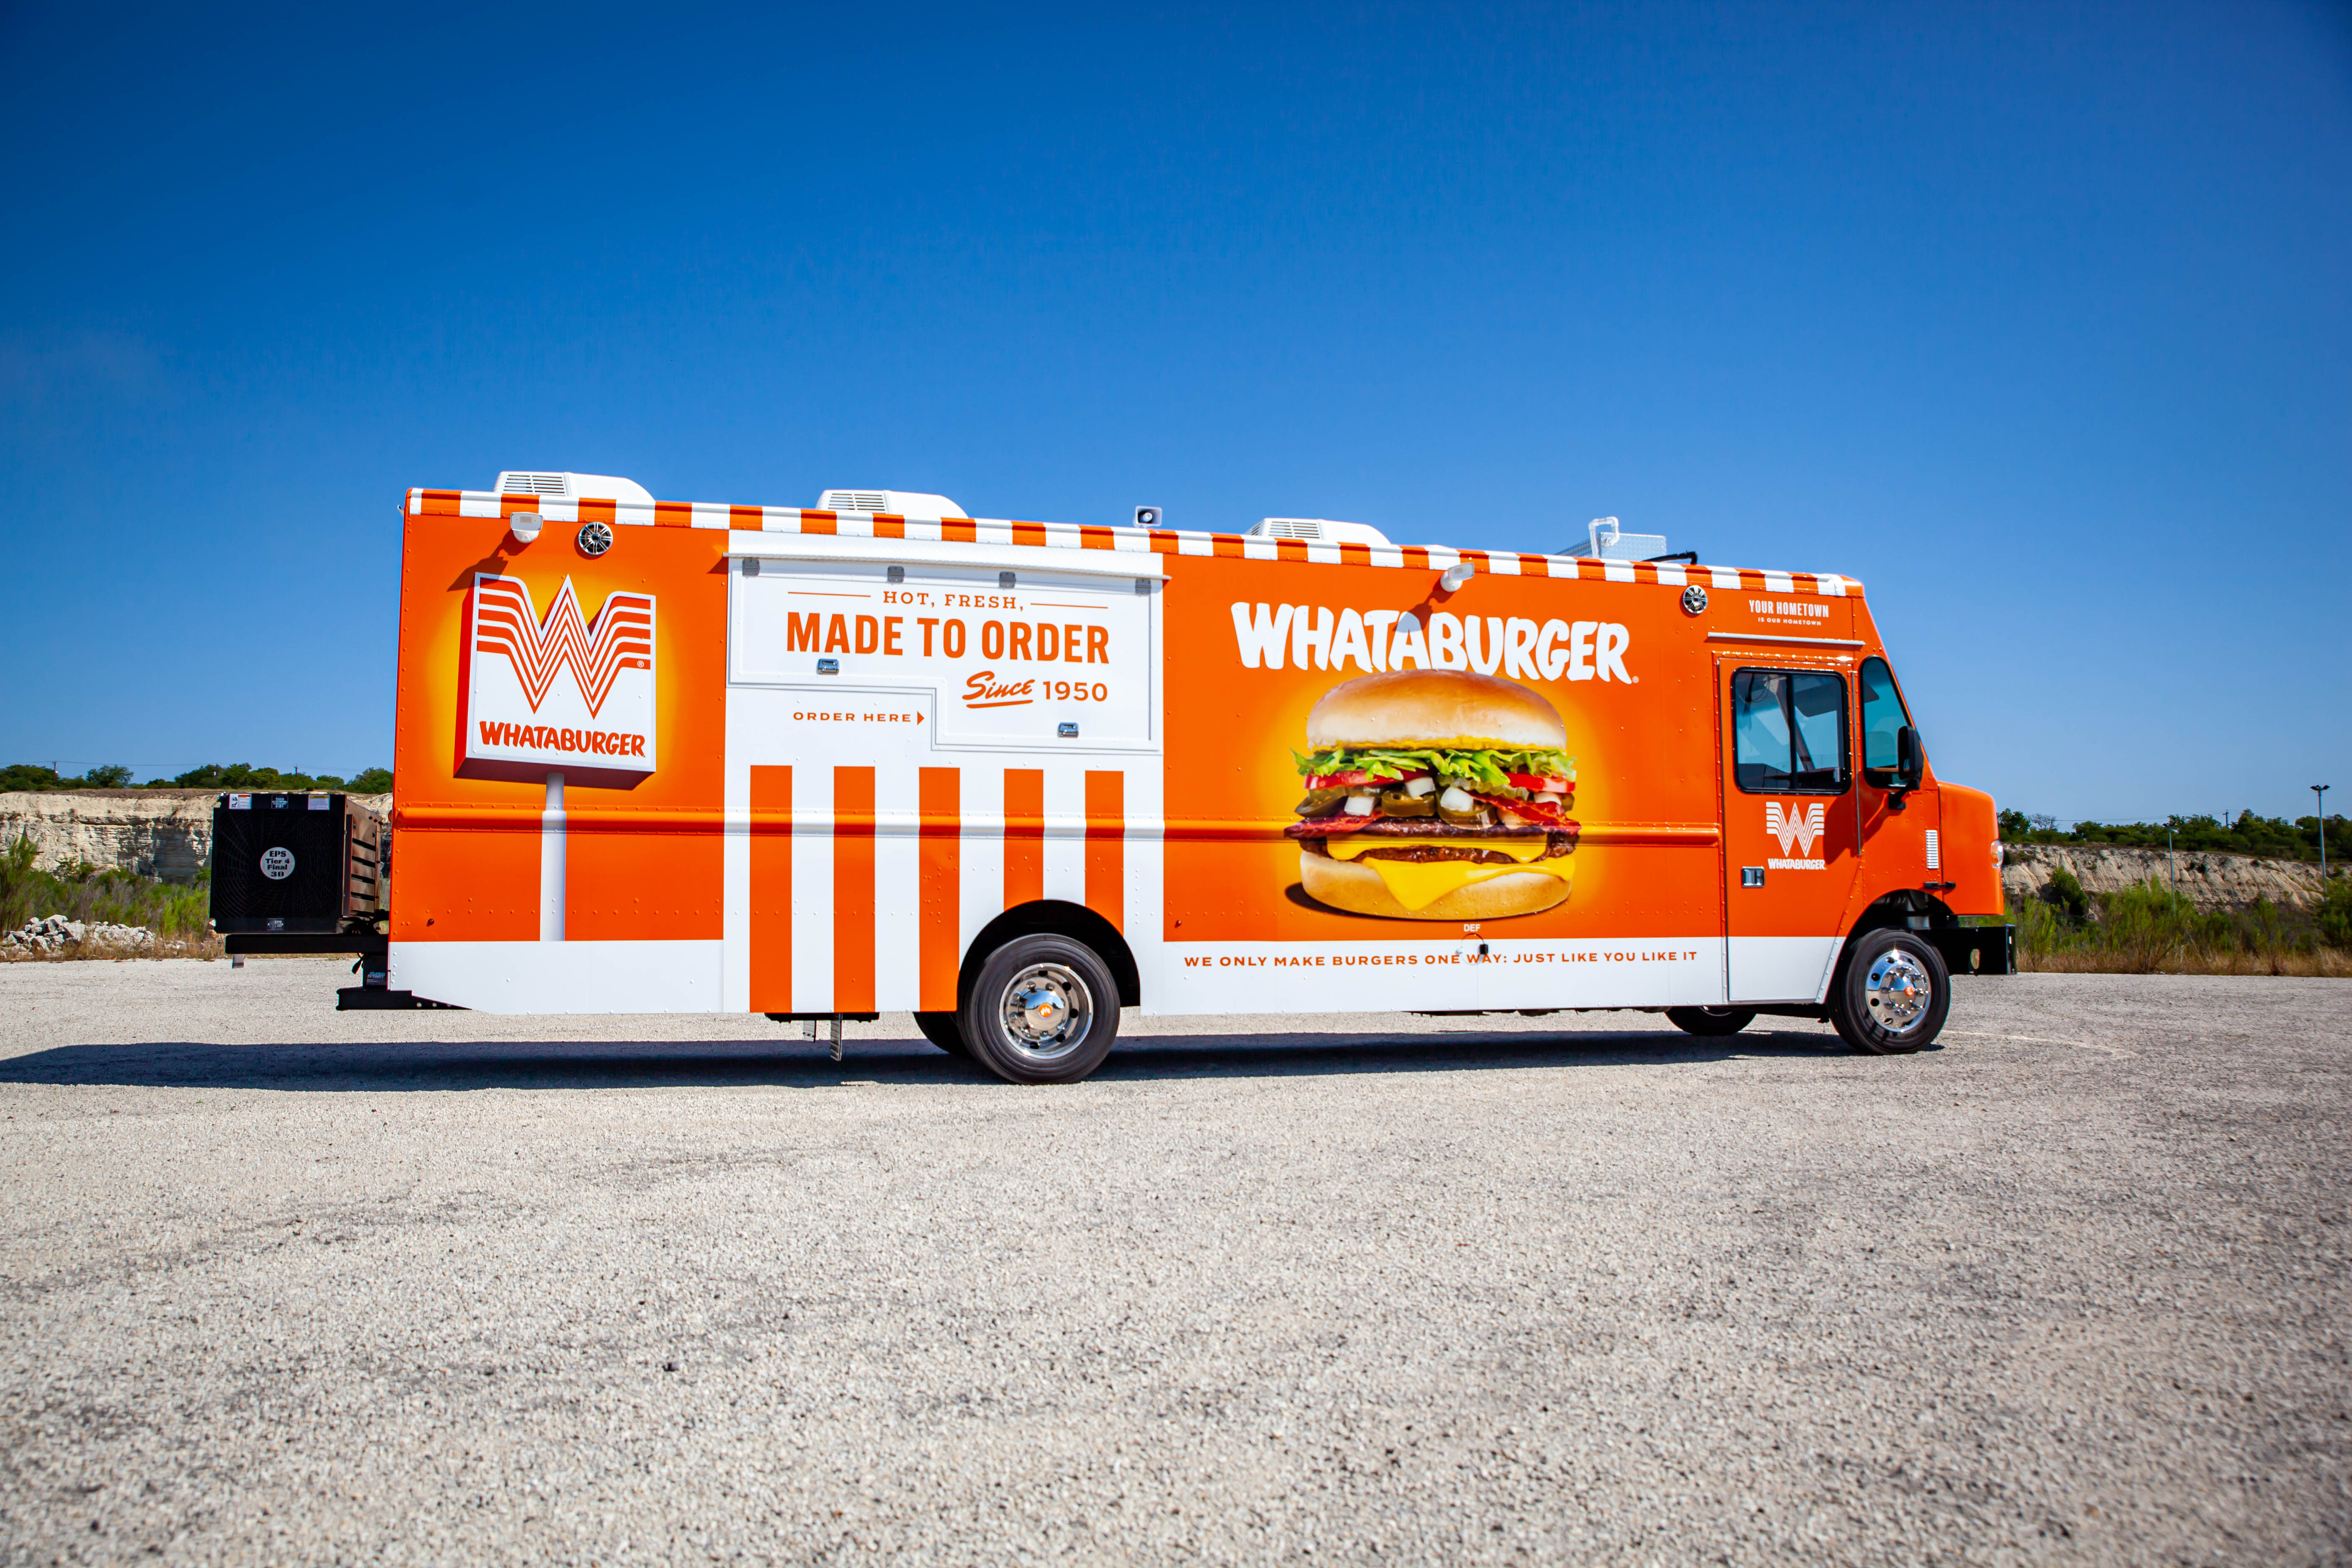 Whataburger's new food truck